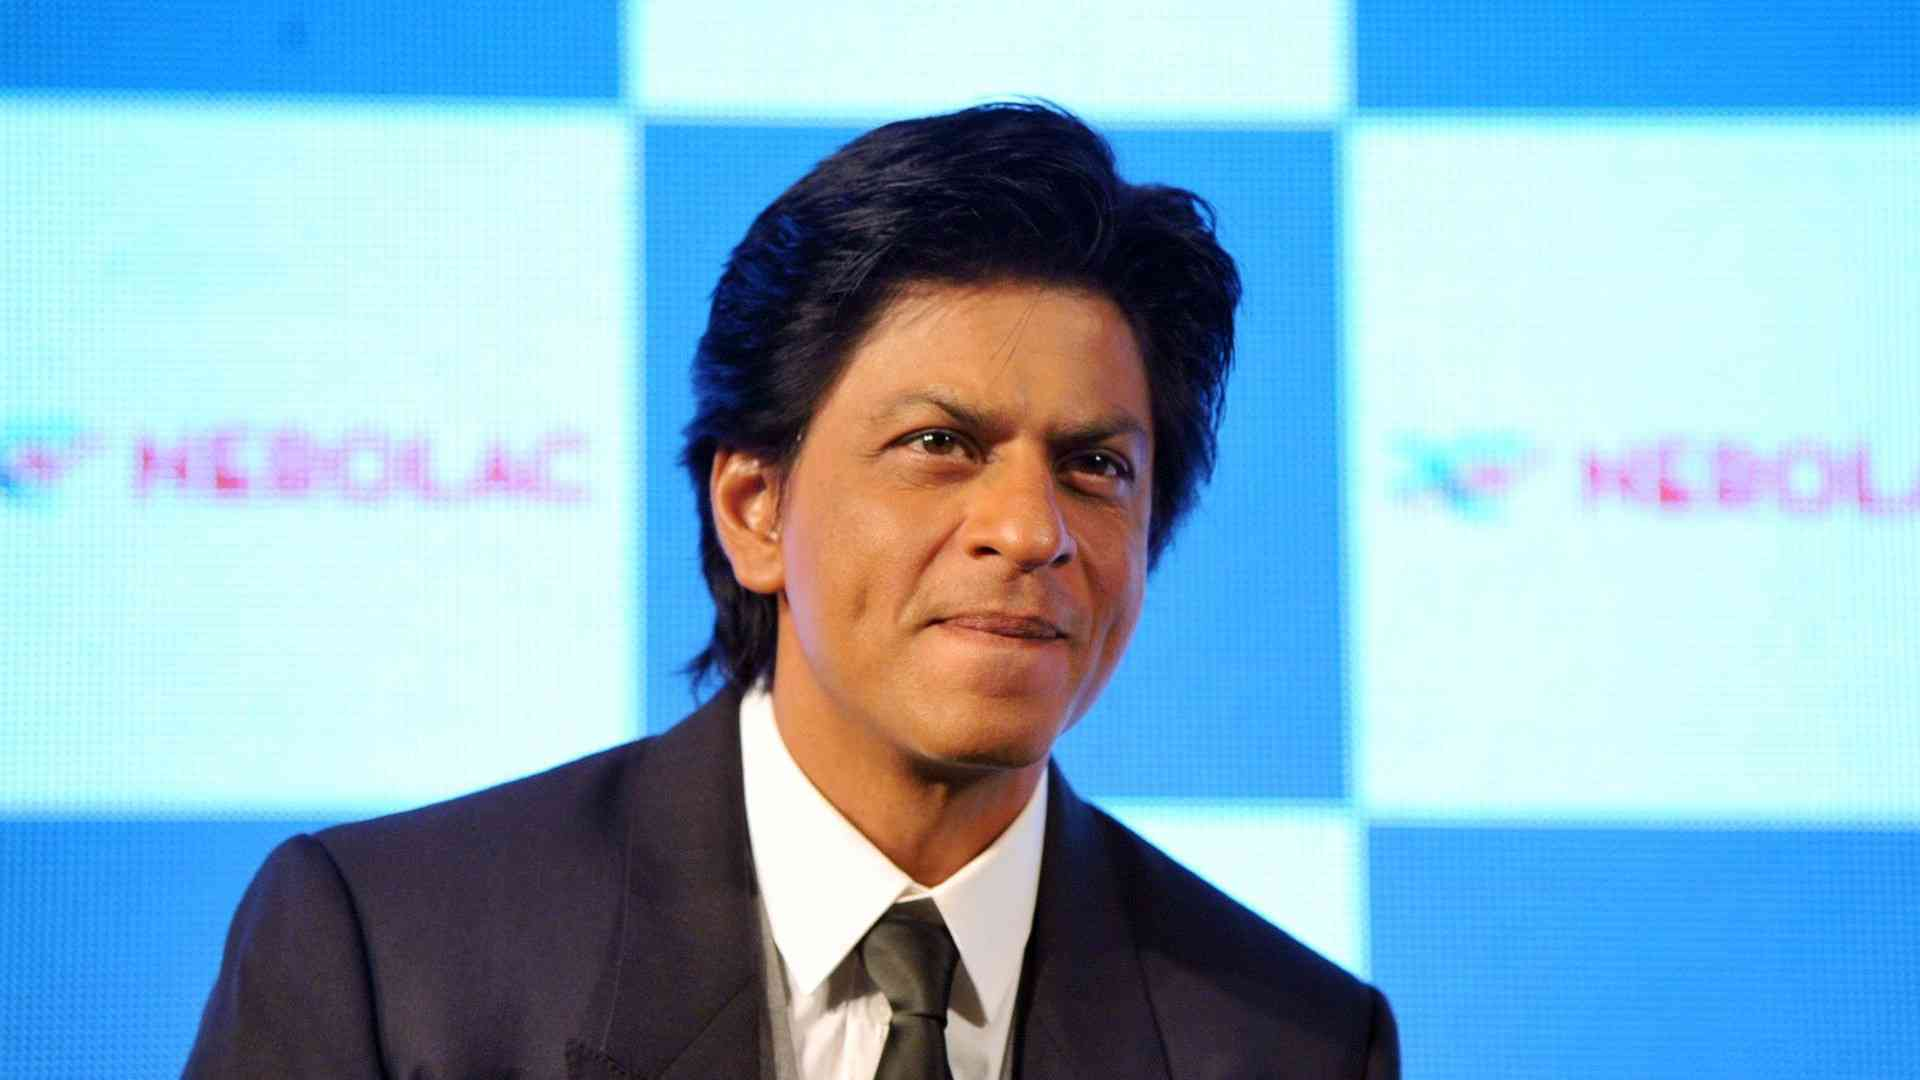 Shah Rukh Khan High Quality Wallpapers